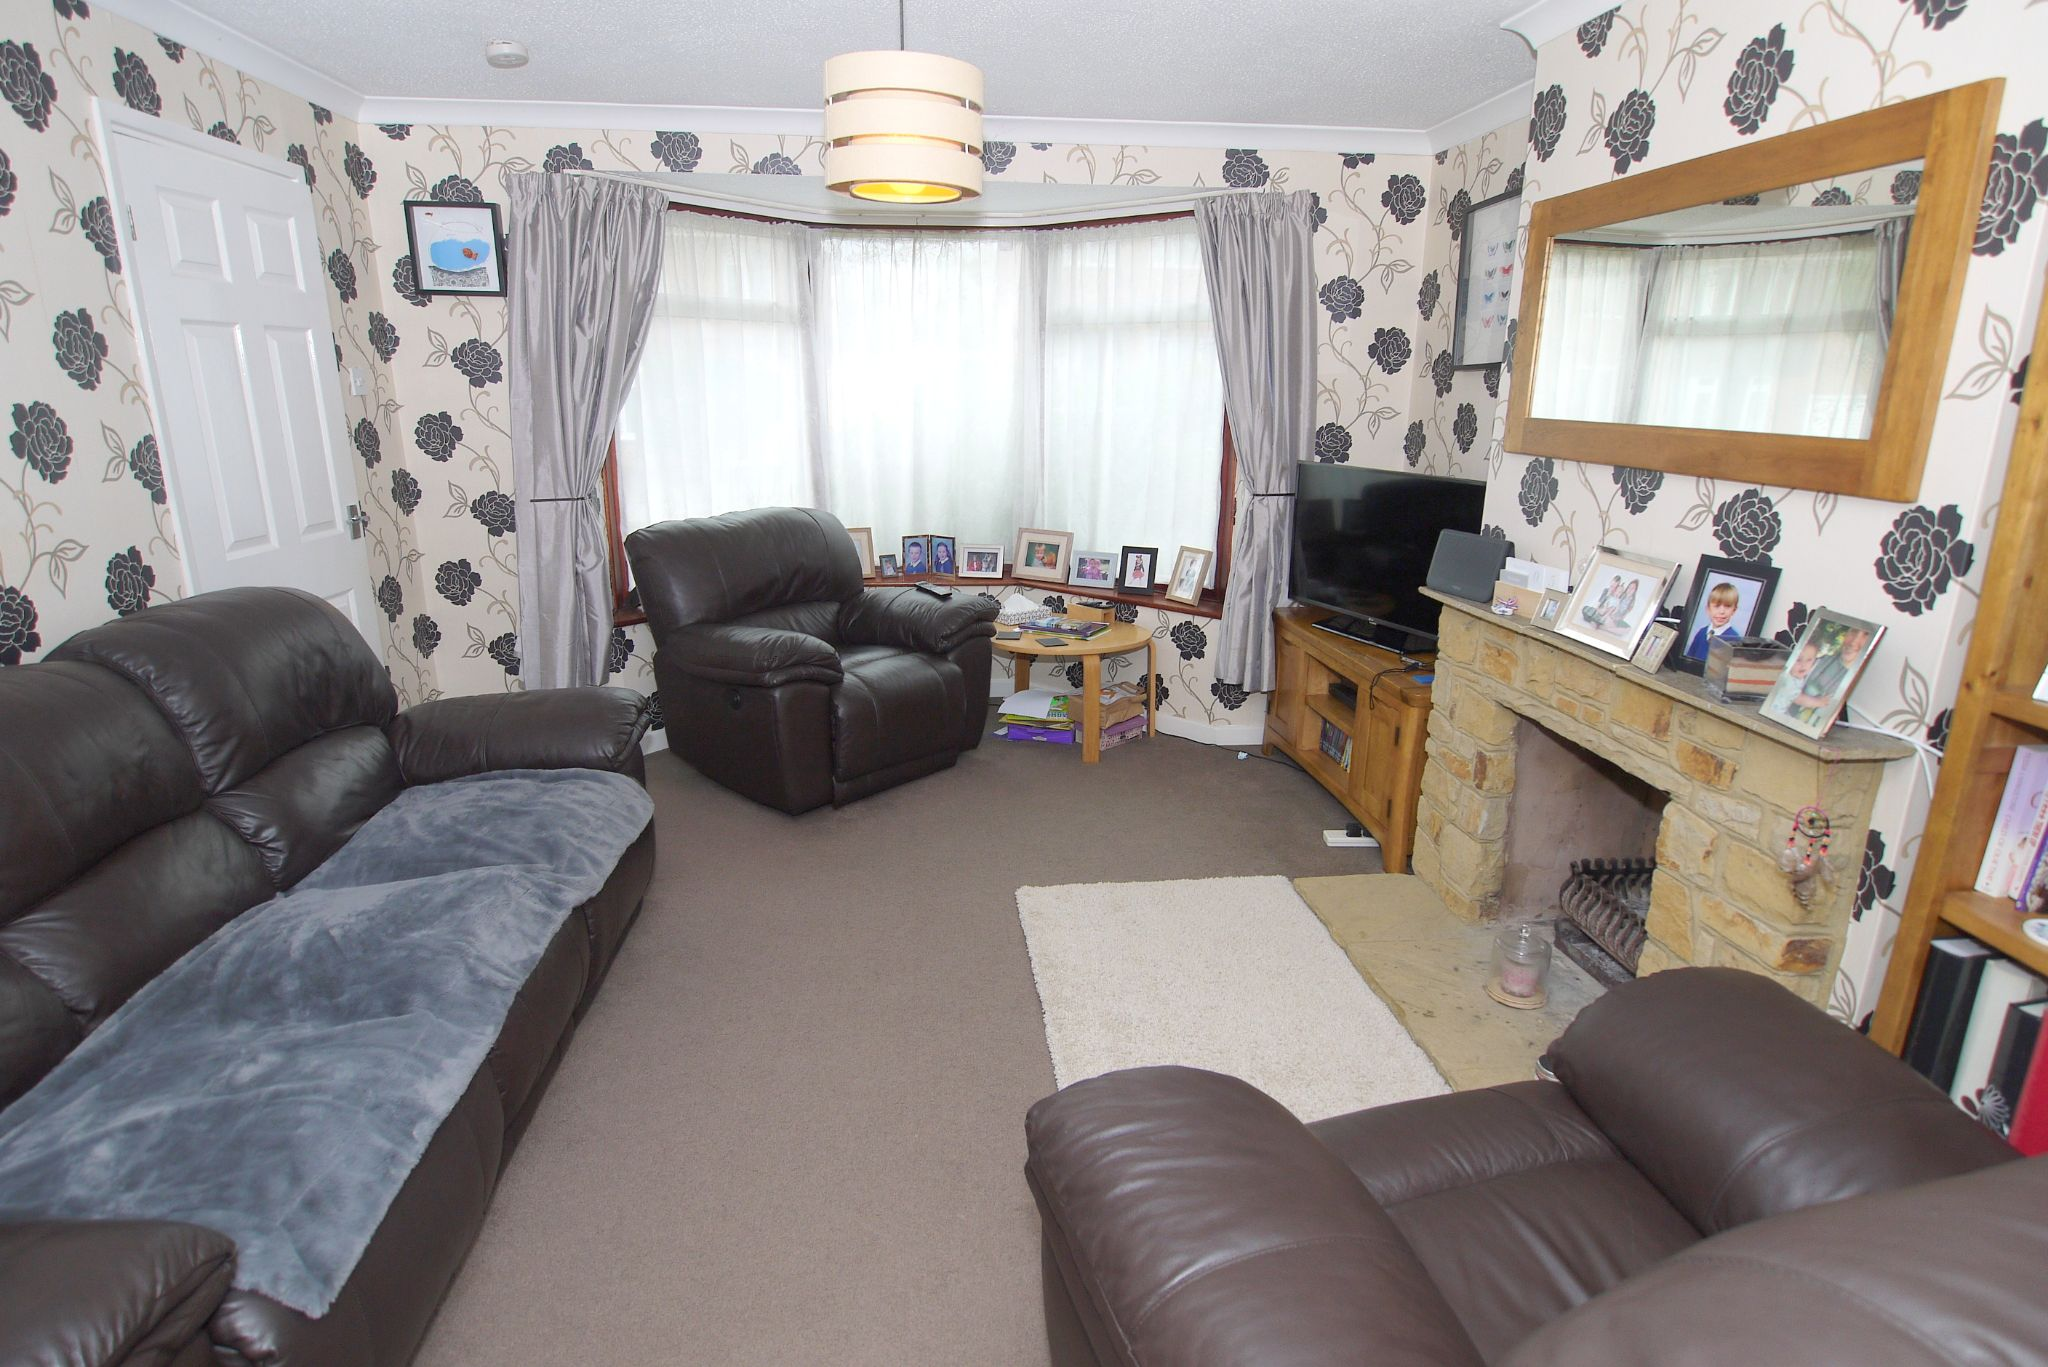 3 bedroom semi-detached house Sold in Sevenoaks - Photograph 2